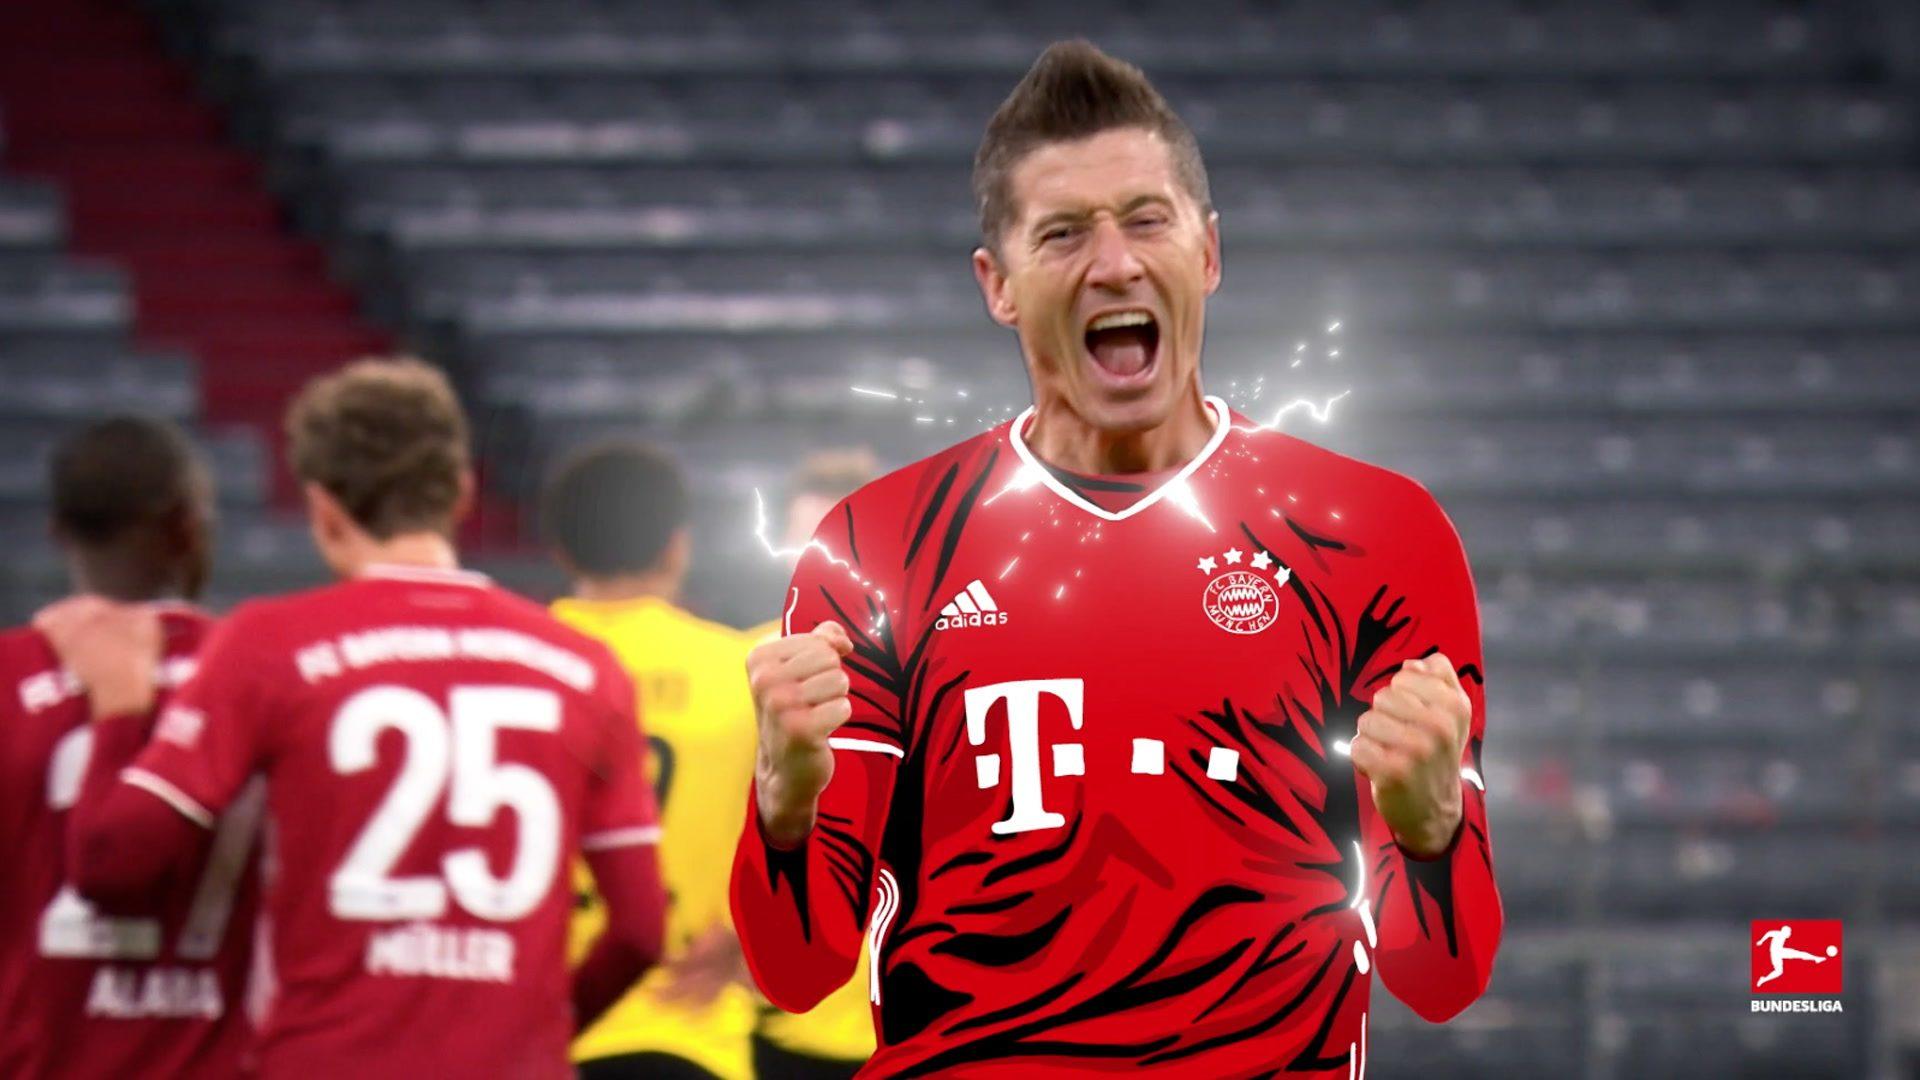 Why Lewandowski deserves to win the Ballon d'Or